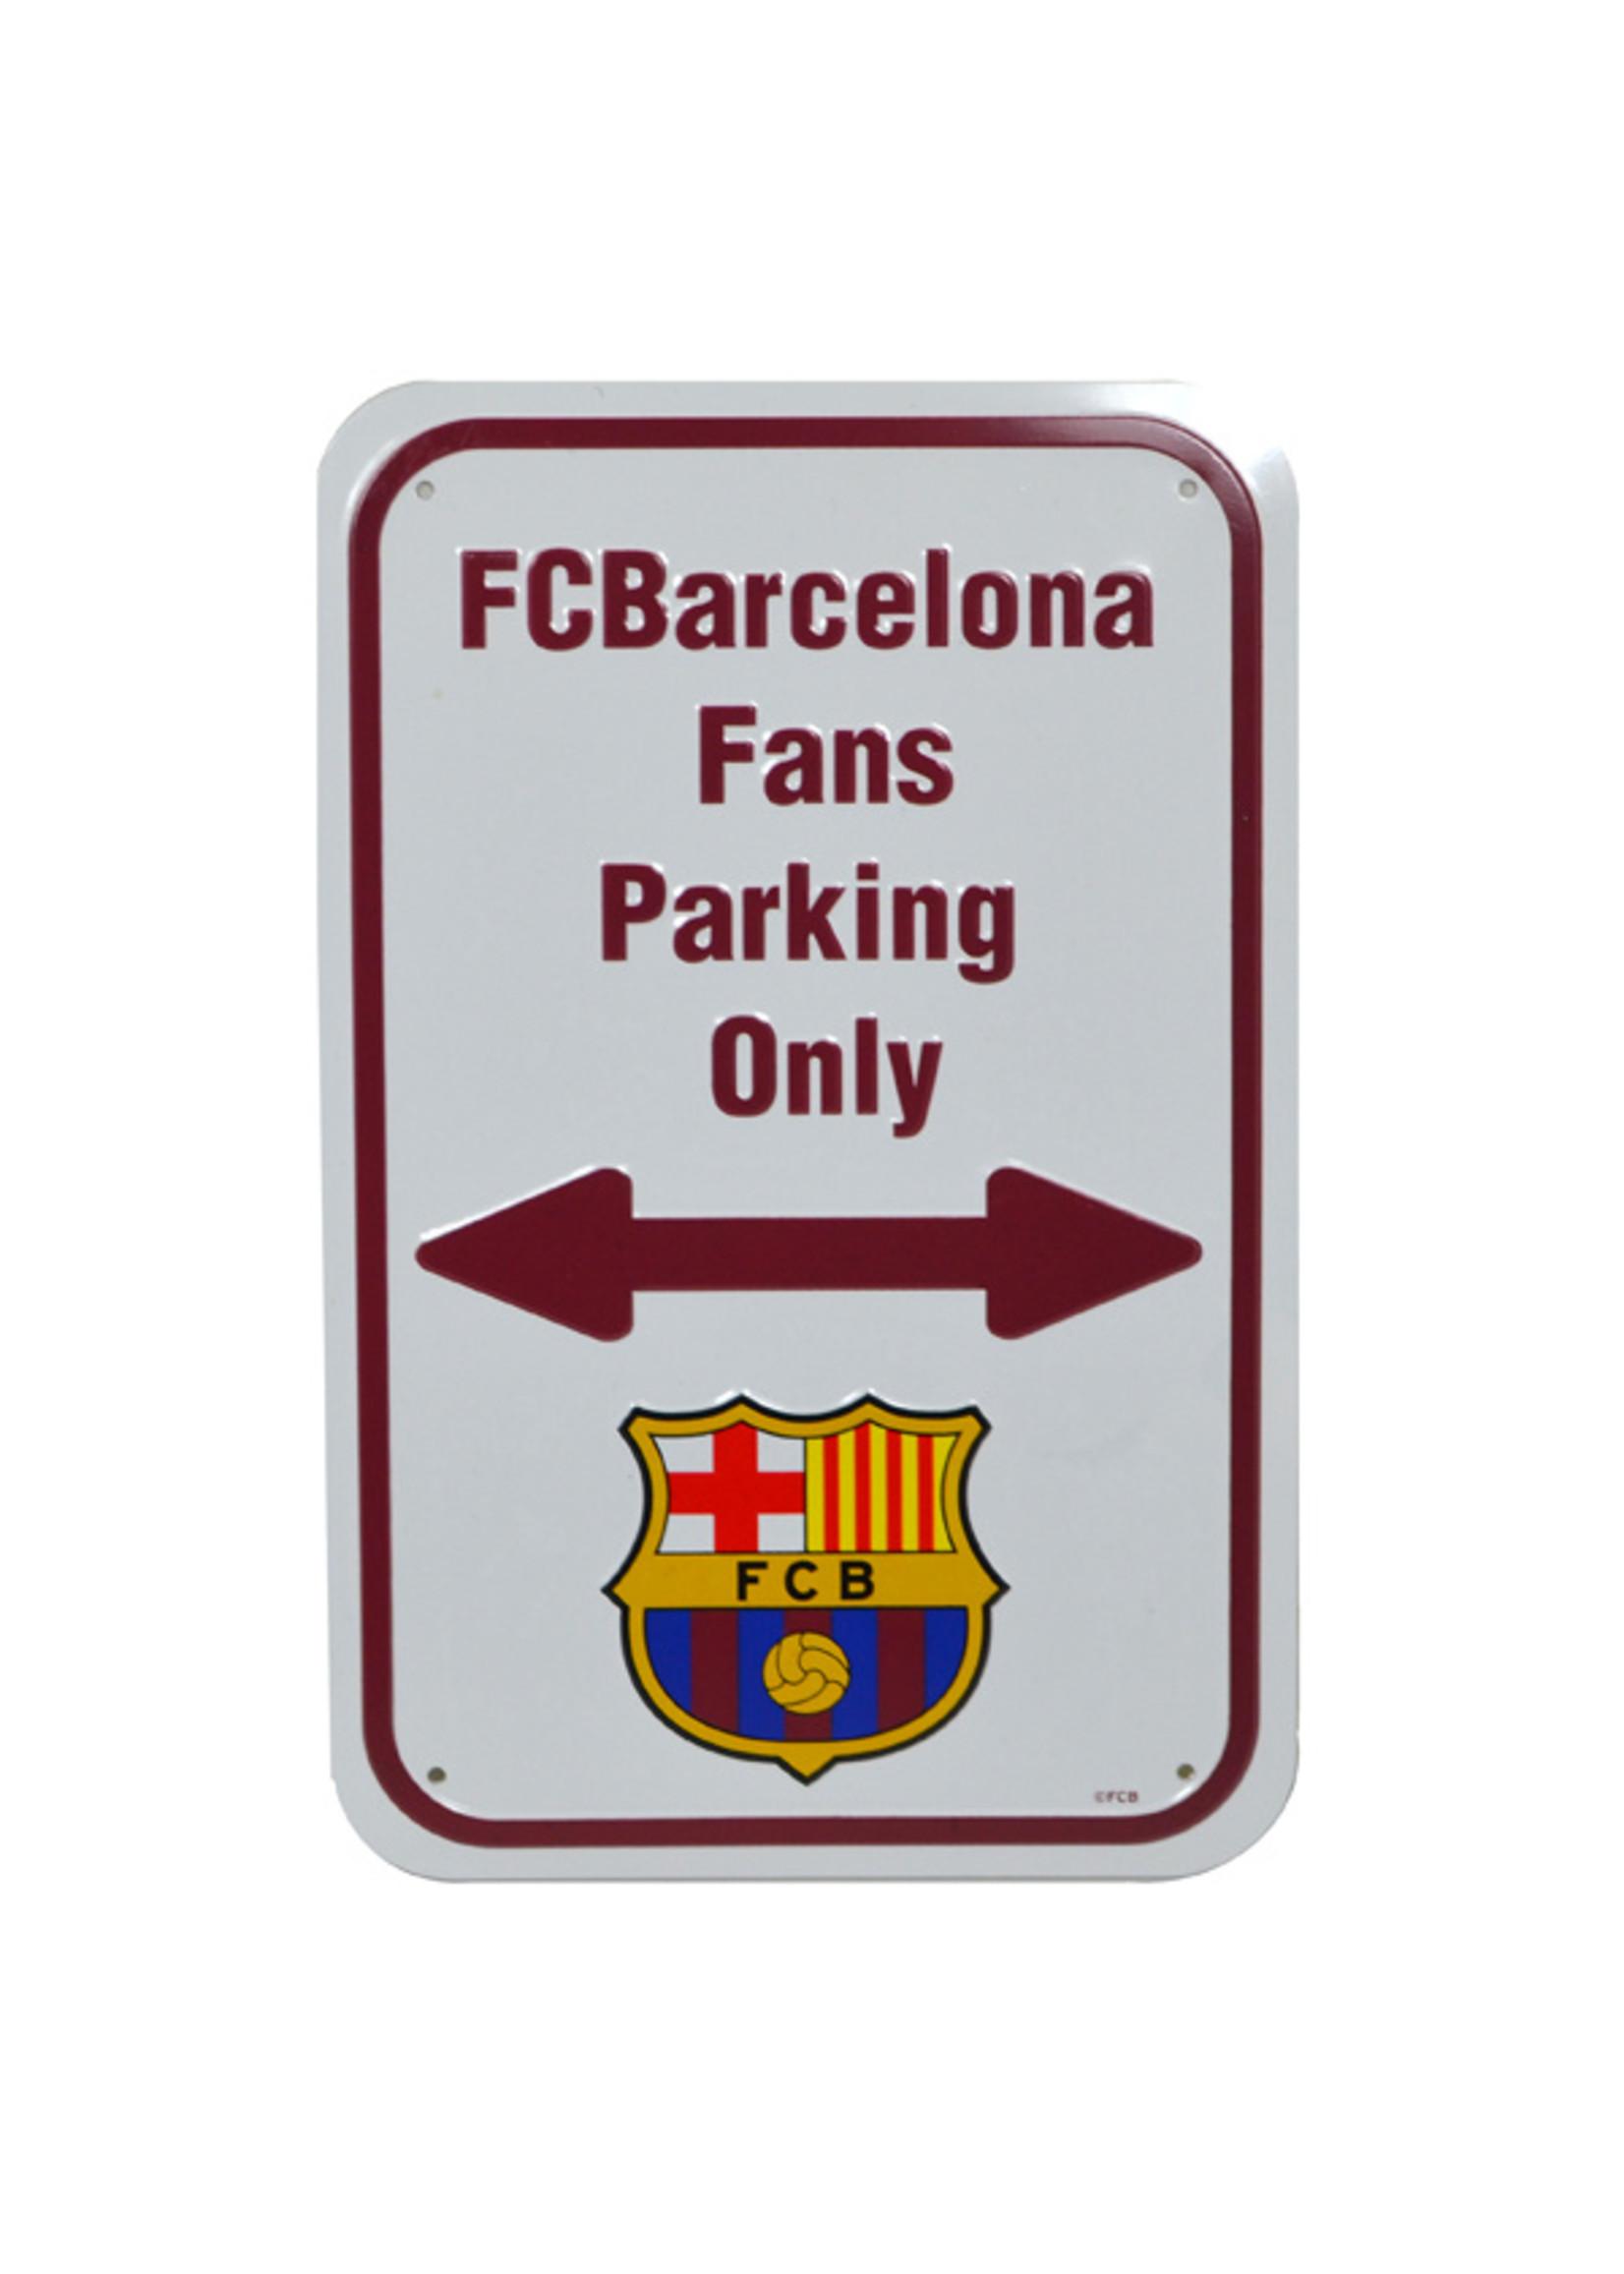 FC Barcelona Fans Parking Only Street Sign